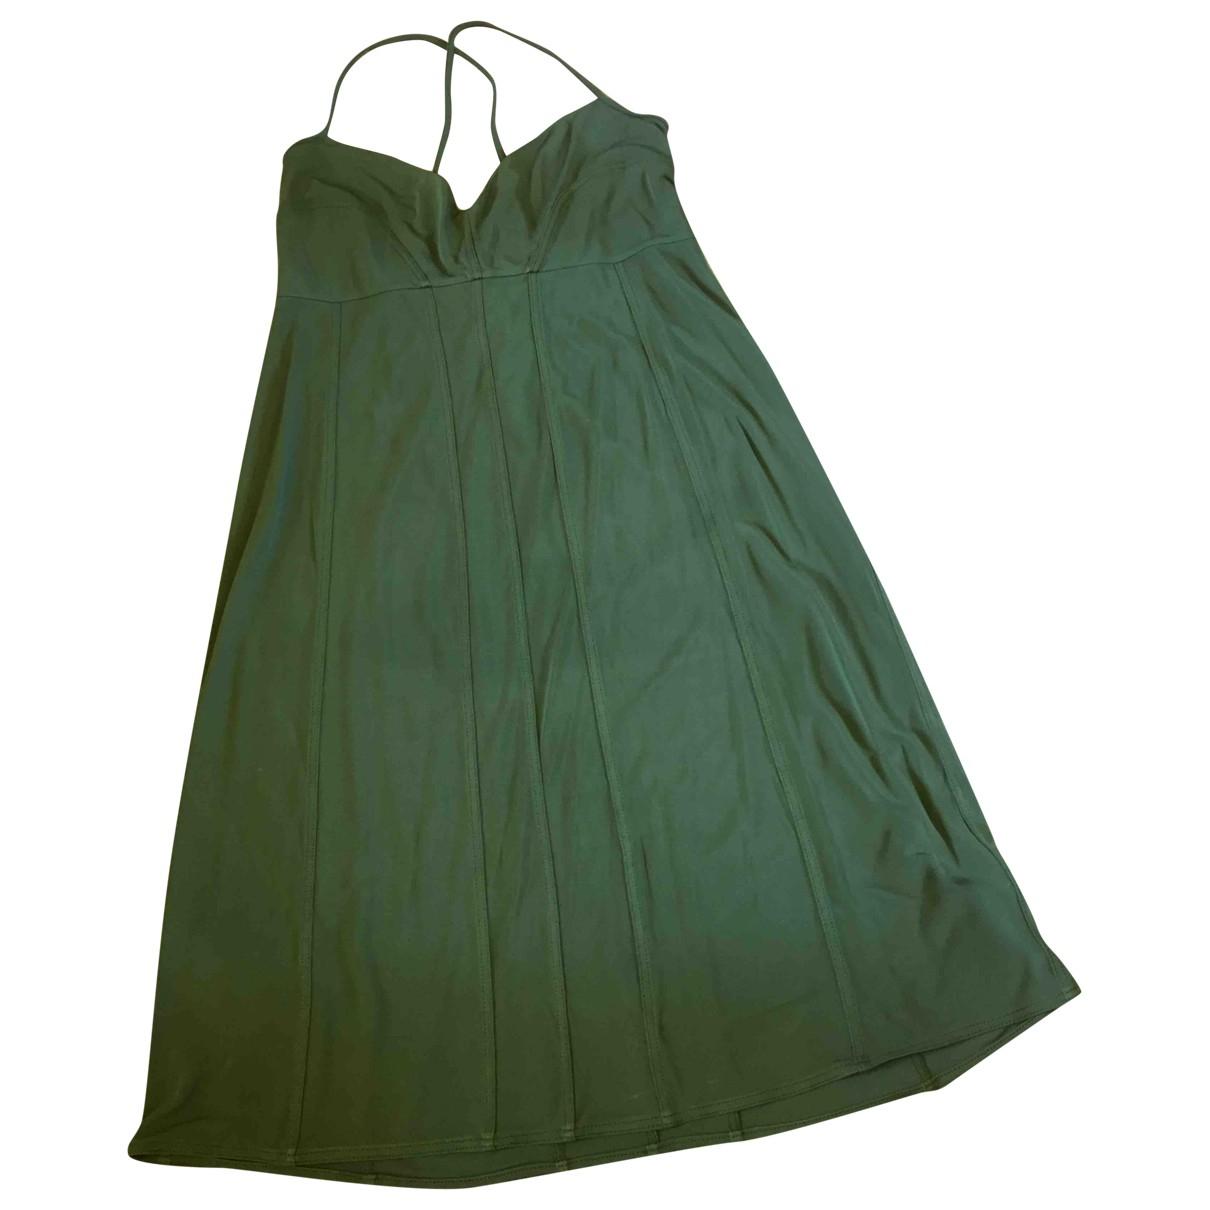 Agnona \N Kleid in  Gruen Viskose